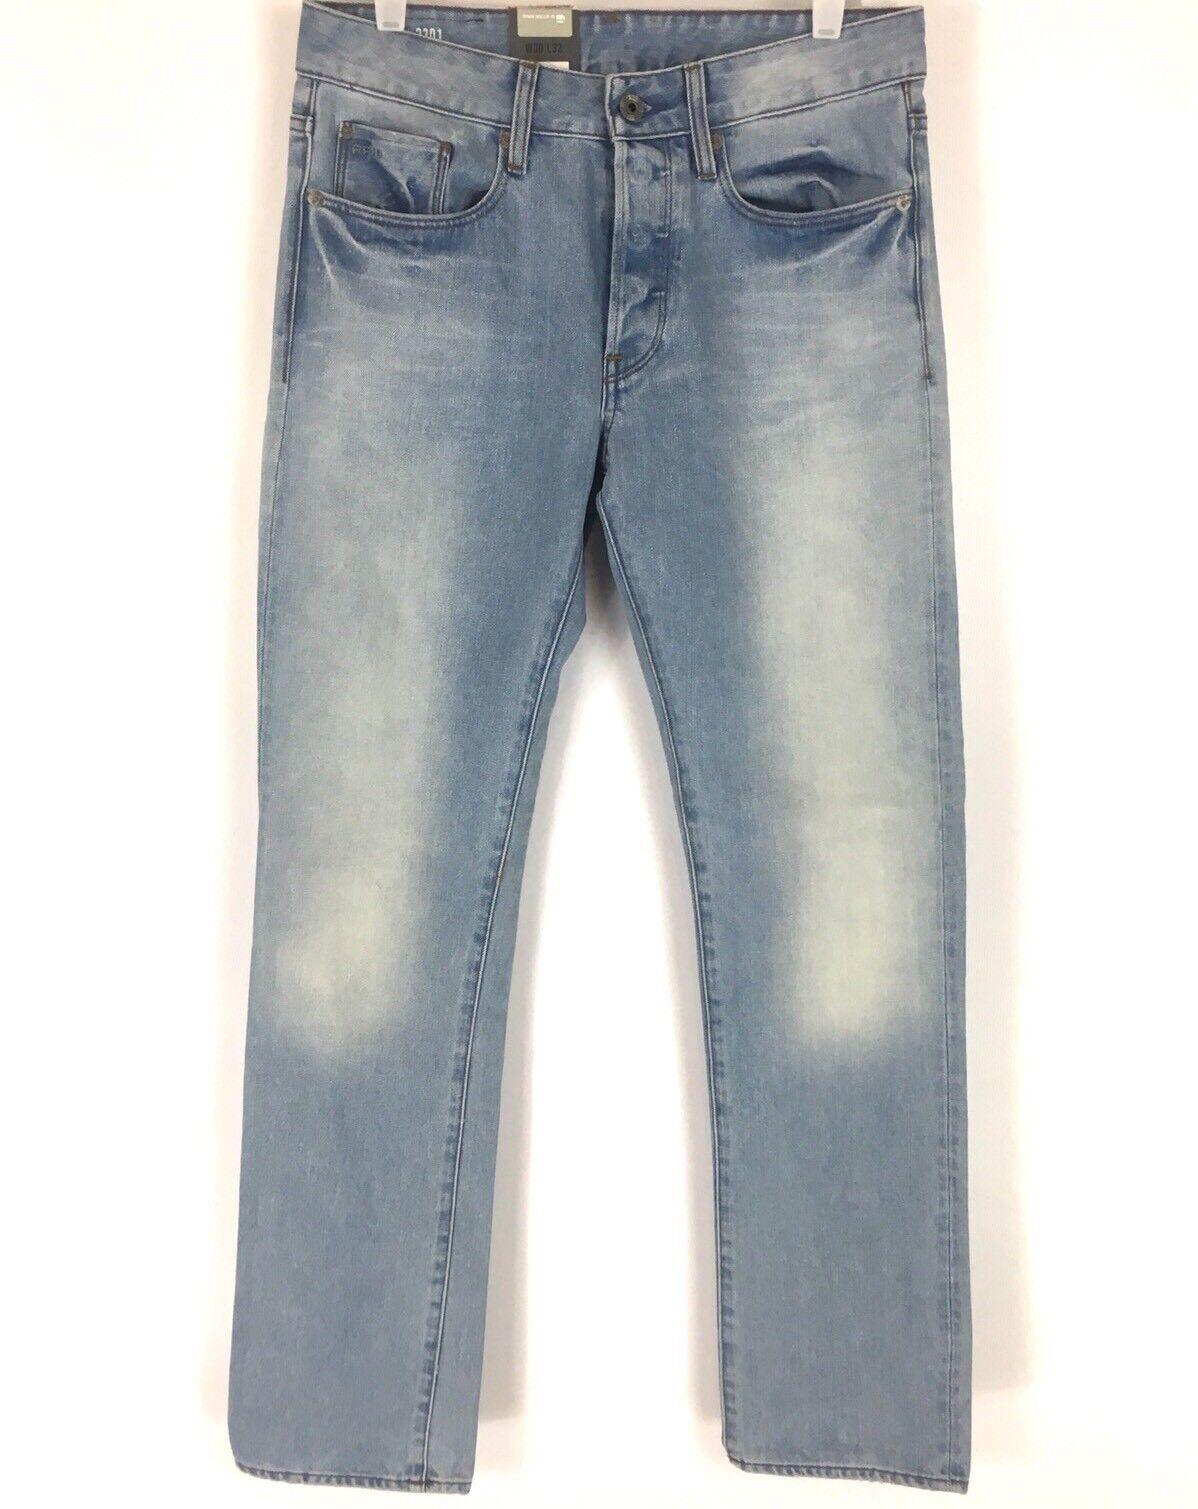 G Star Mens 3301 Slim Straight Jeans Light Aged Wisk Denim Size 30 NWT